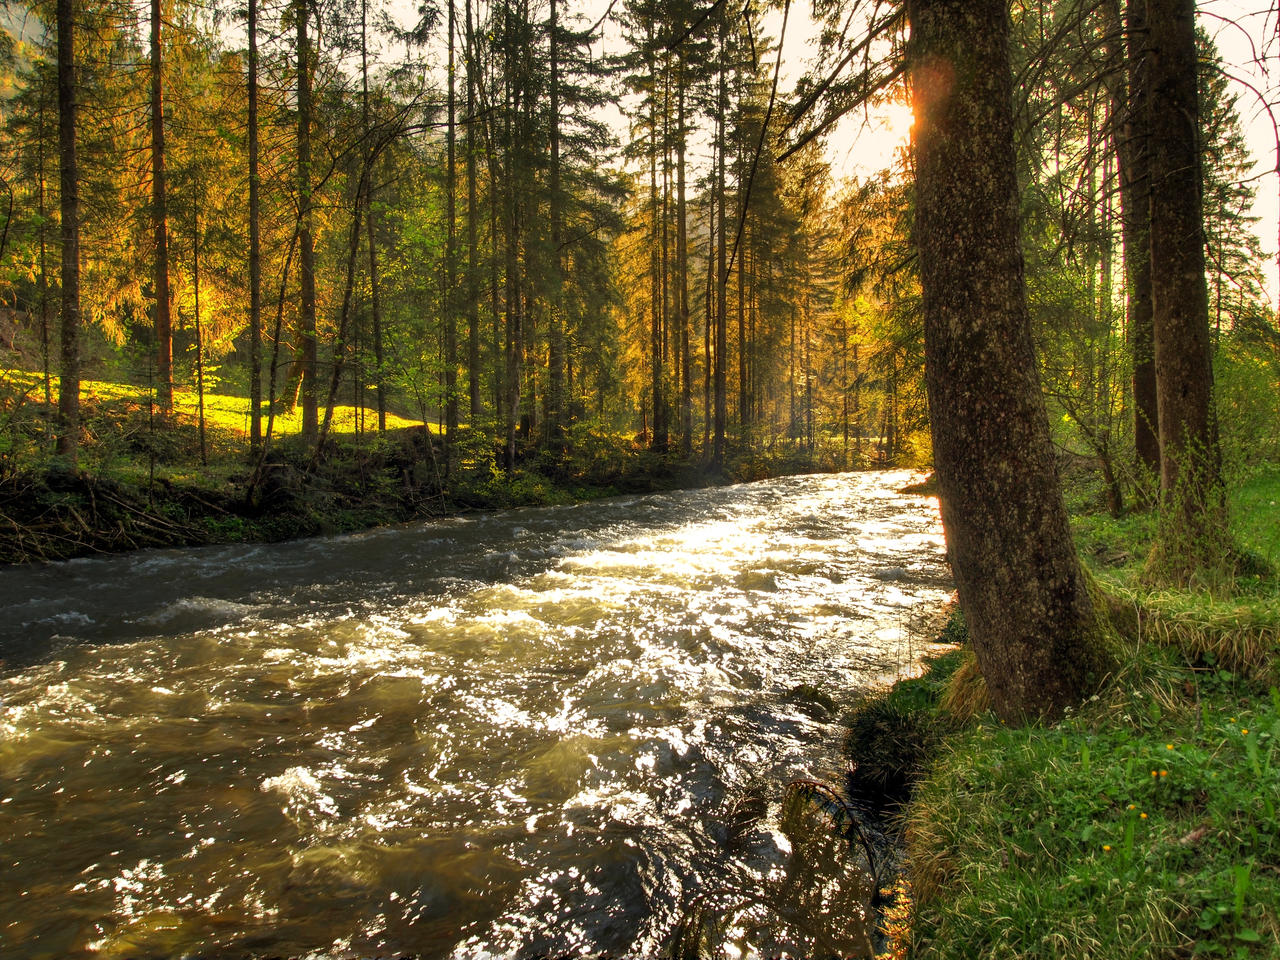 River Sunset by Burtn